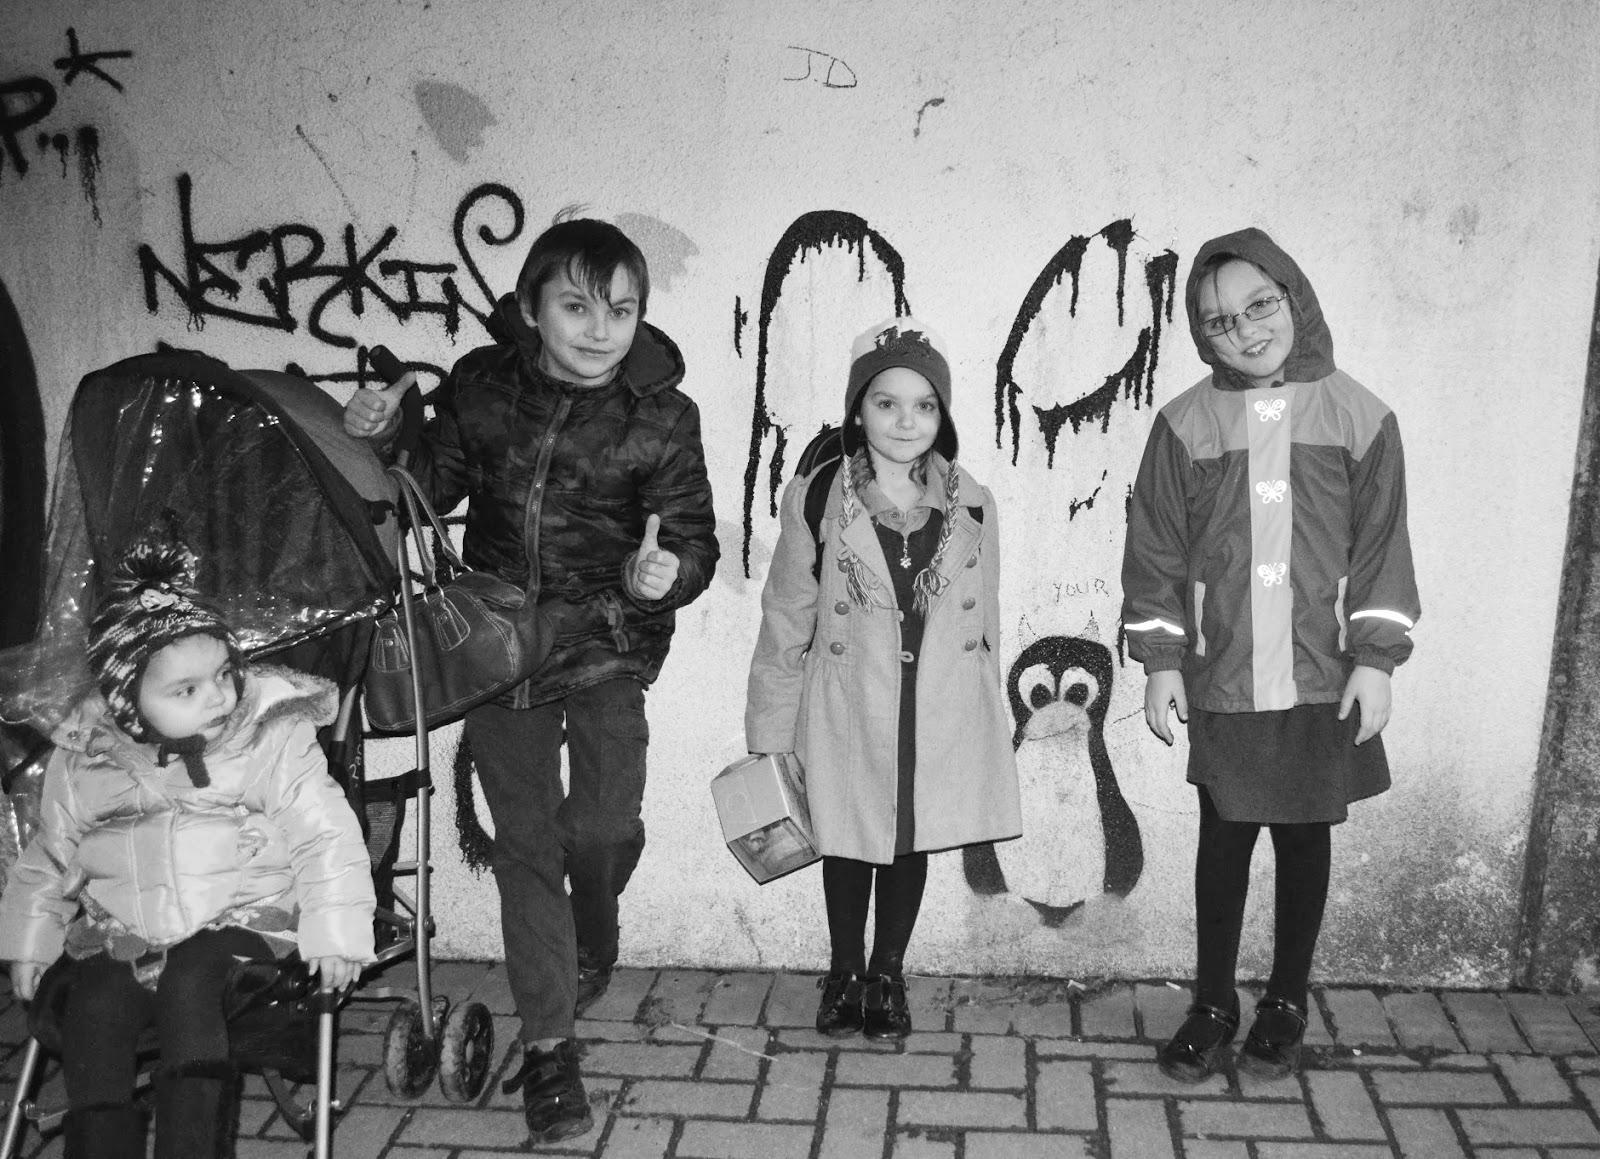 Kids silhouette photo monochrome tunnel light grafitti Haverfordwest